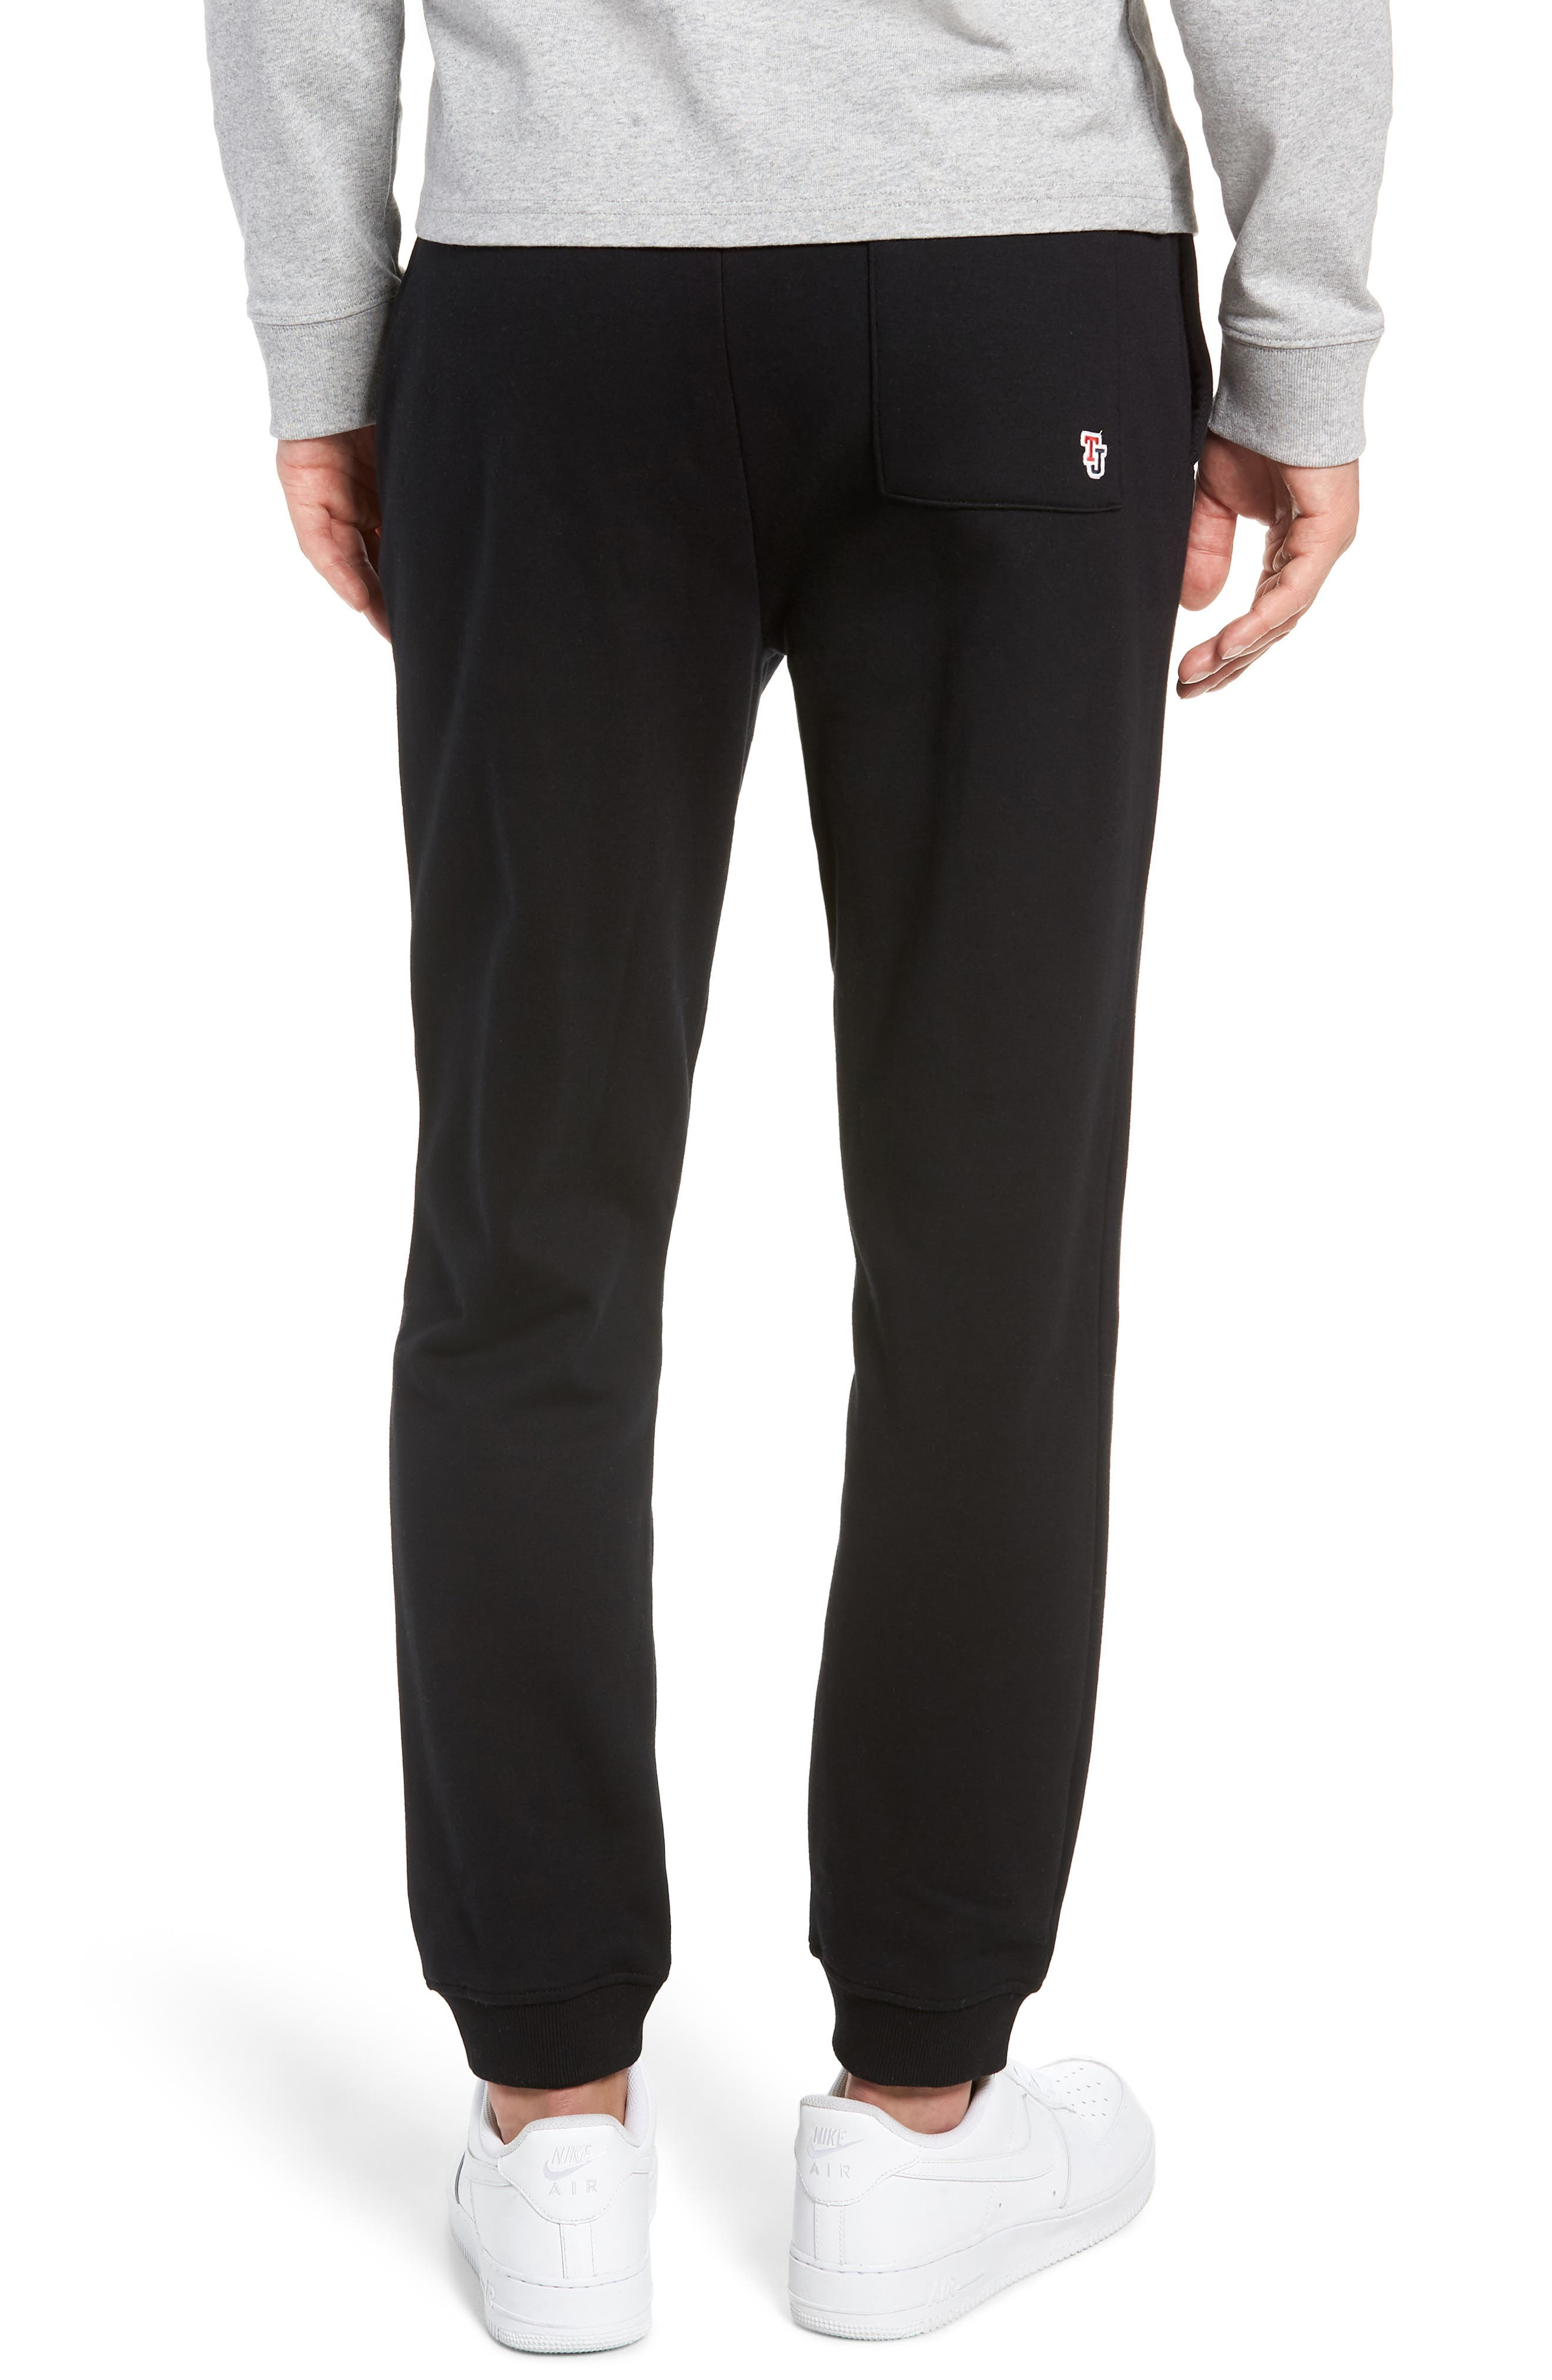 TJM Classics Sweatpants,                             Alternate thumbnail 2, color,                             TOMMY BLACK